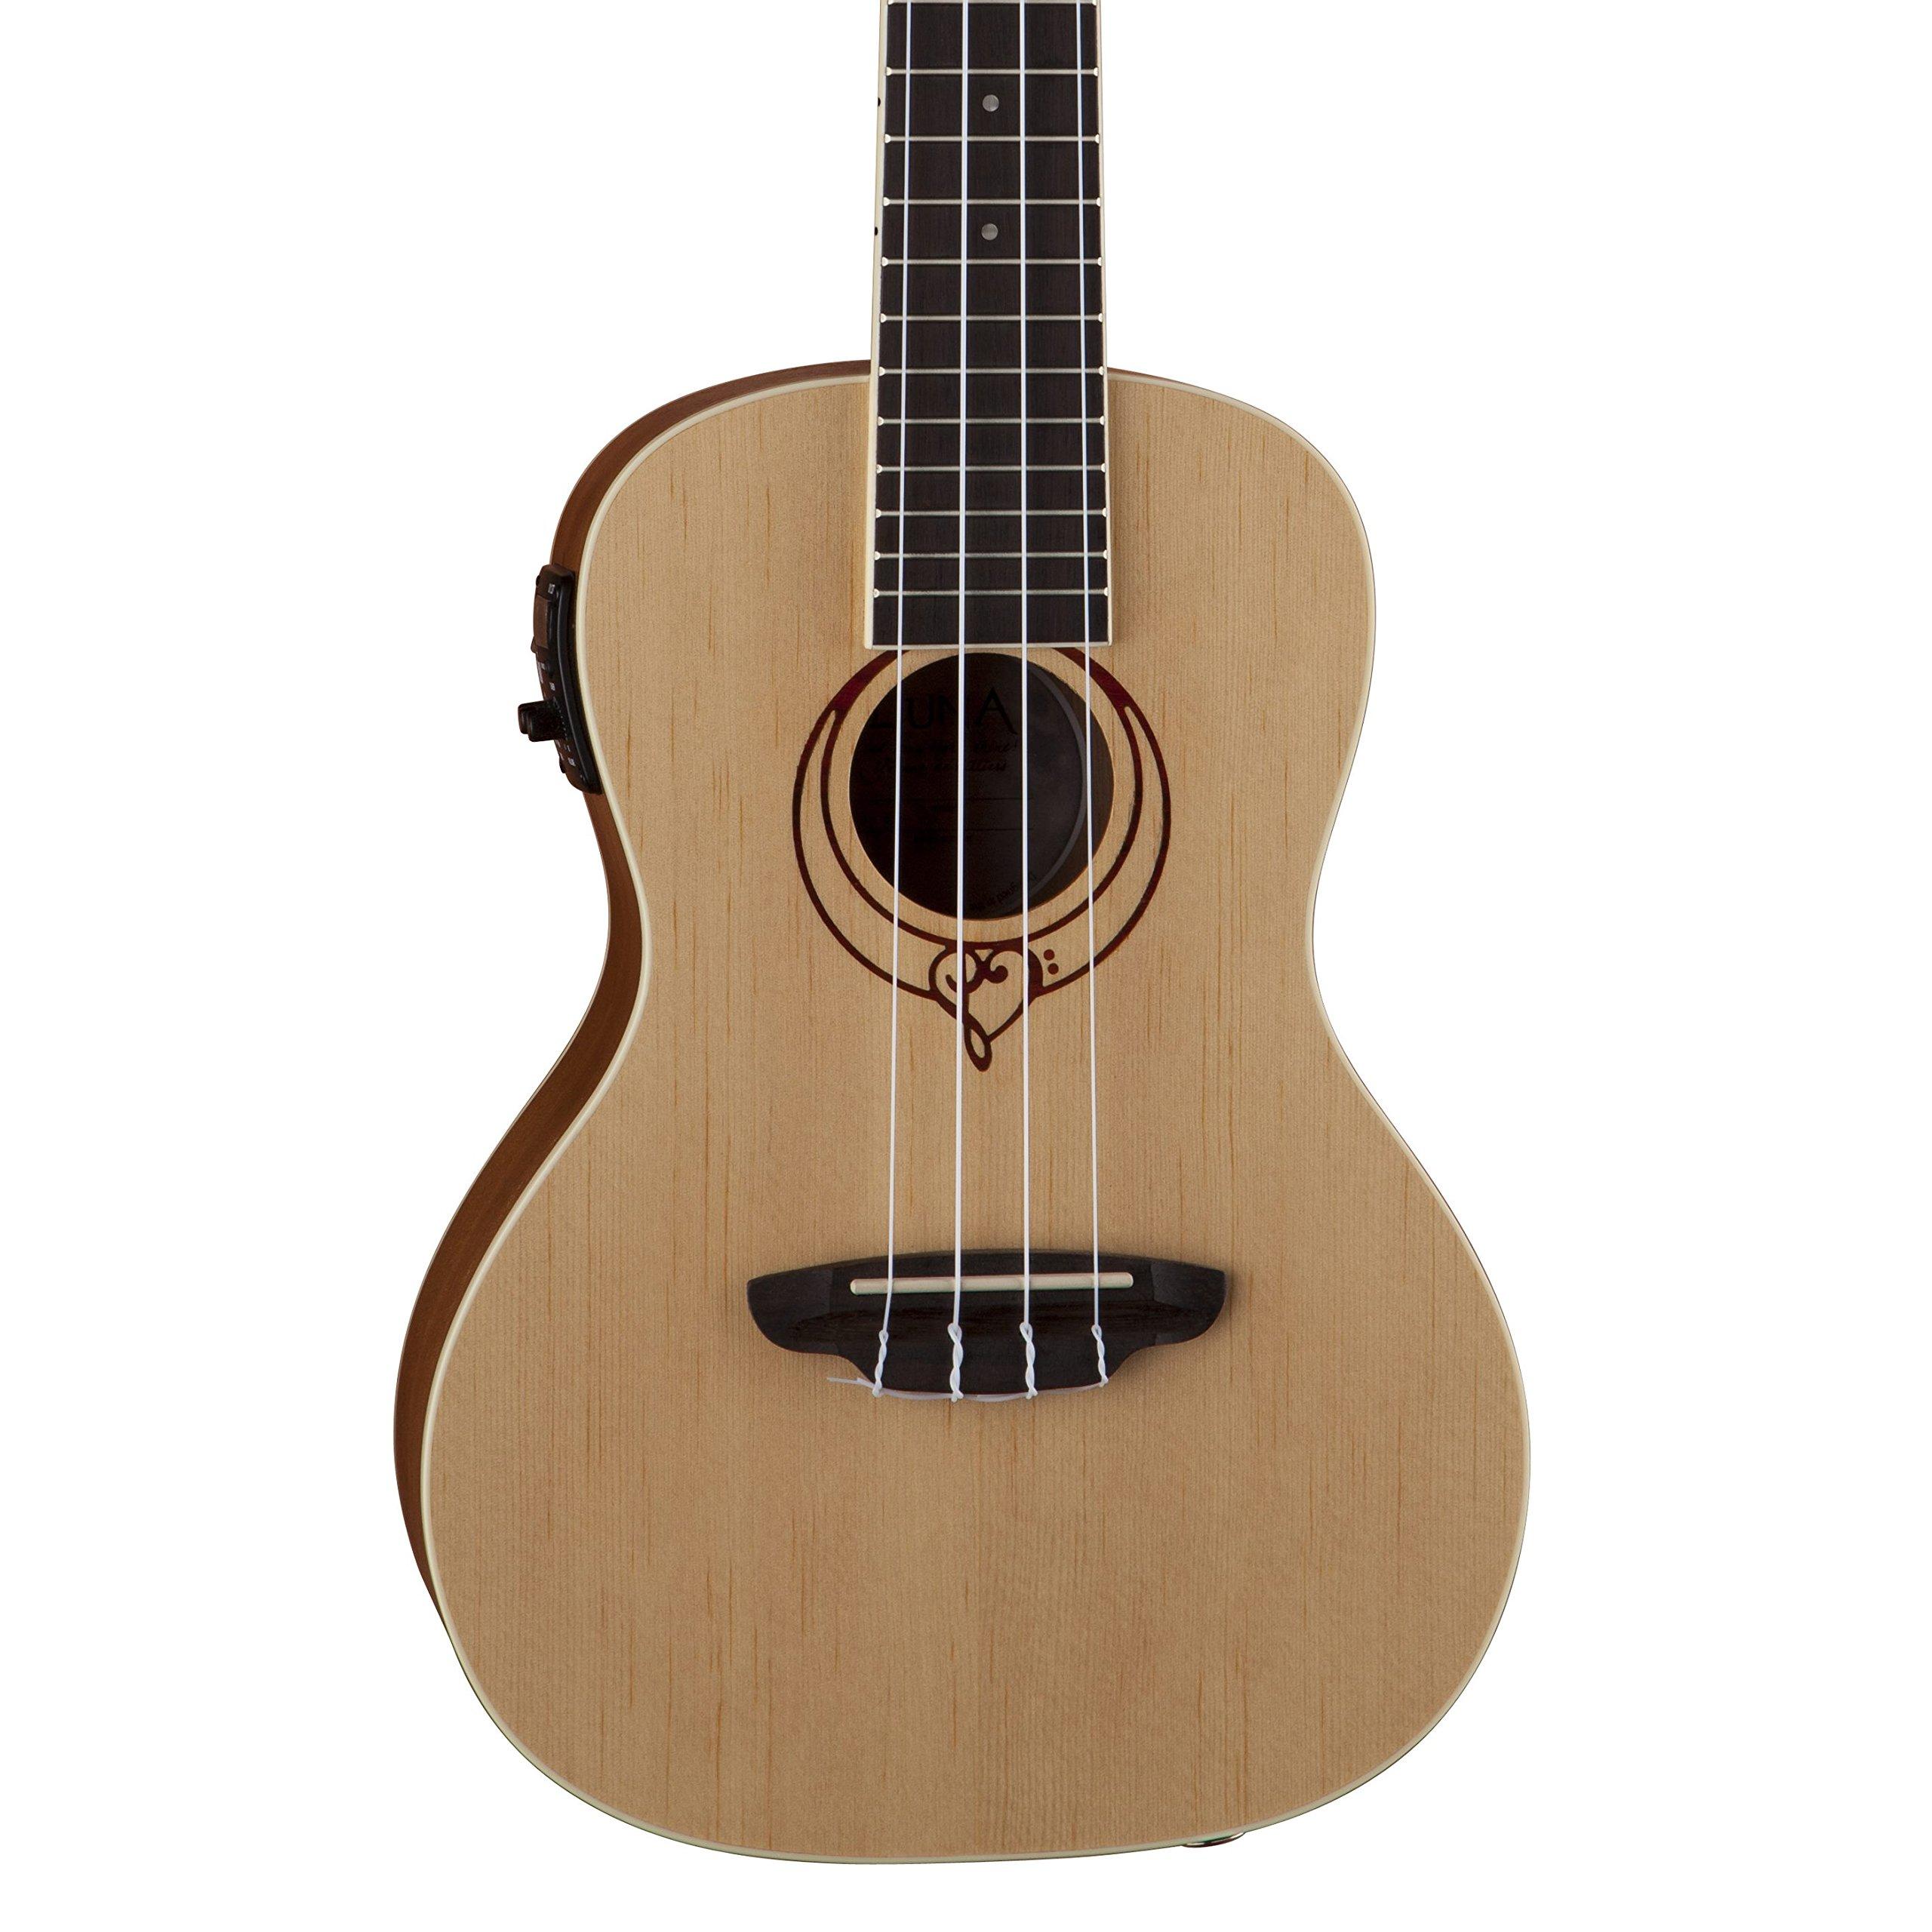 Luna Heartsong Spruce Acoustic/Electric Concert Ukulele with USB Preamp & Gig Bag, Satin Natural by Luna Guitars (Image #1)